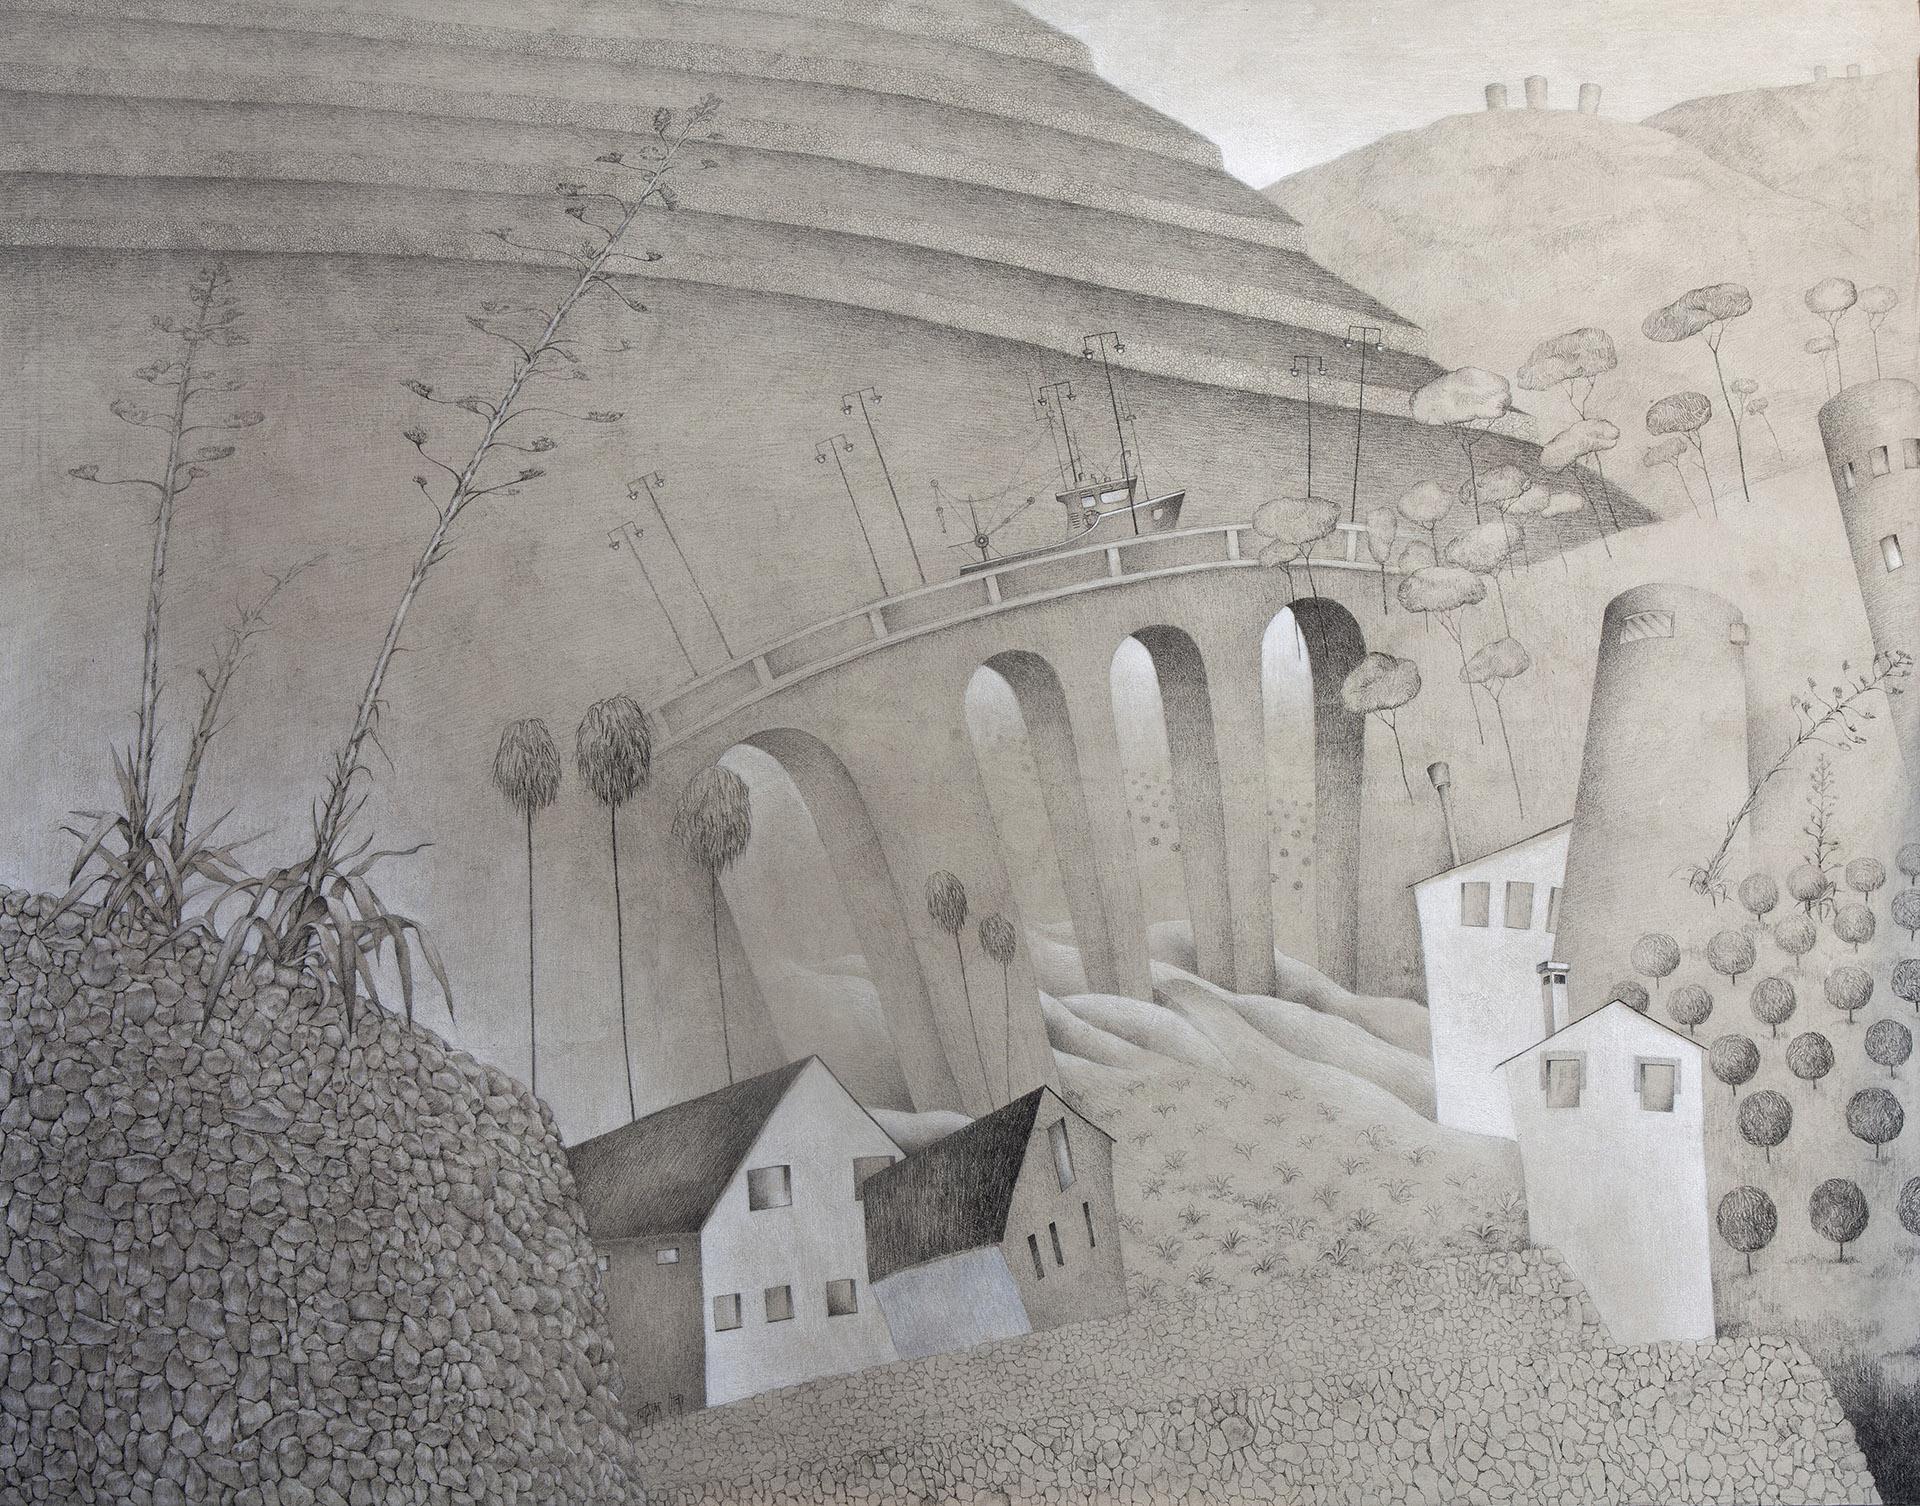 """MARINA ALTA III""  Grafito y Tiza S/Lienzo  120x154 cm. 2019 Gata de Gorgos"